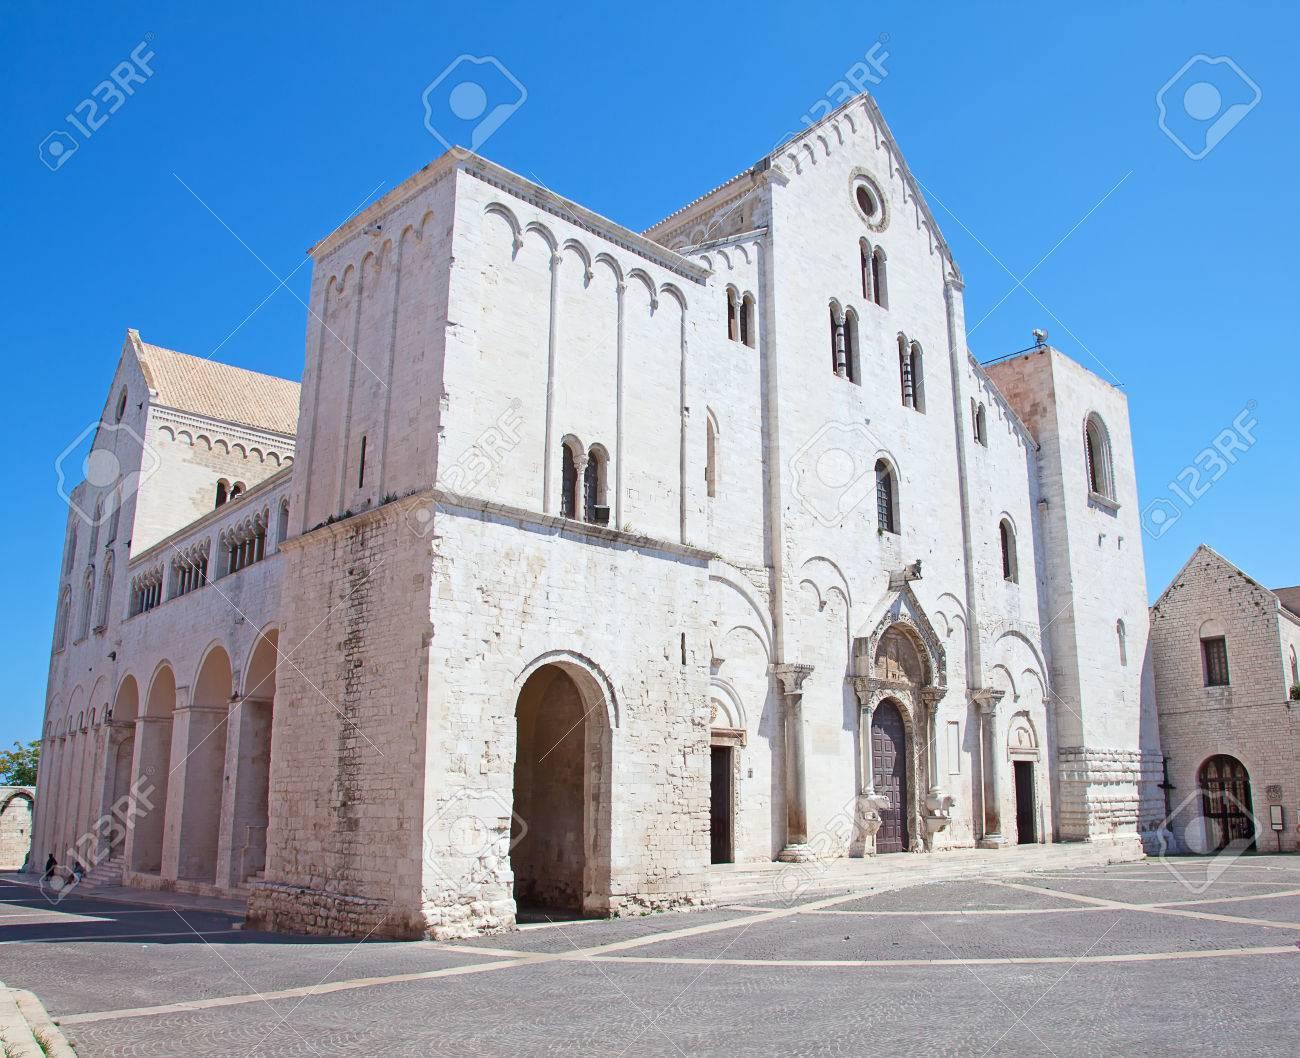 Famous Saint Nicholas church in Bari, Italy - 32439959